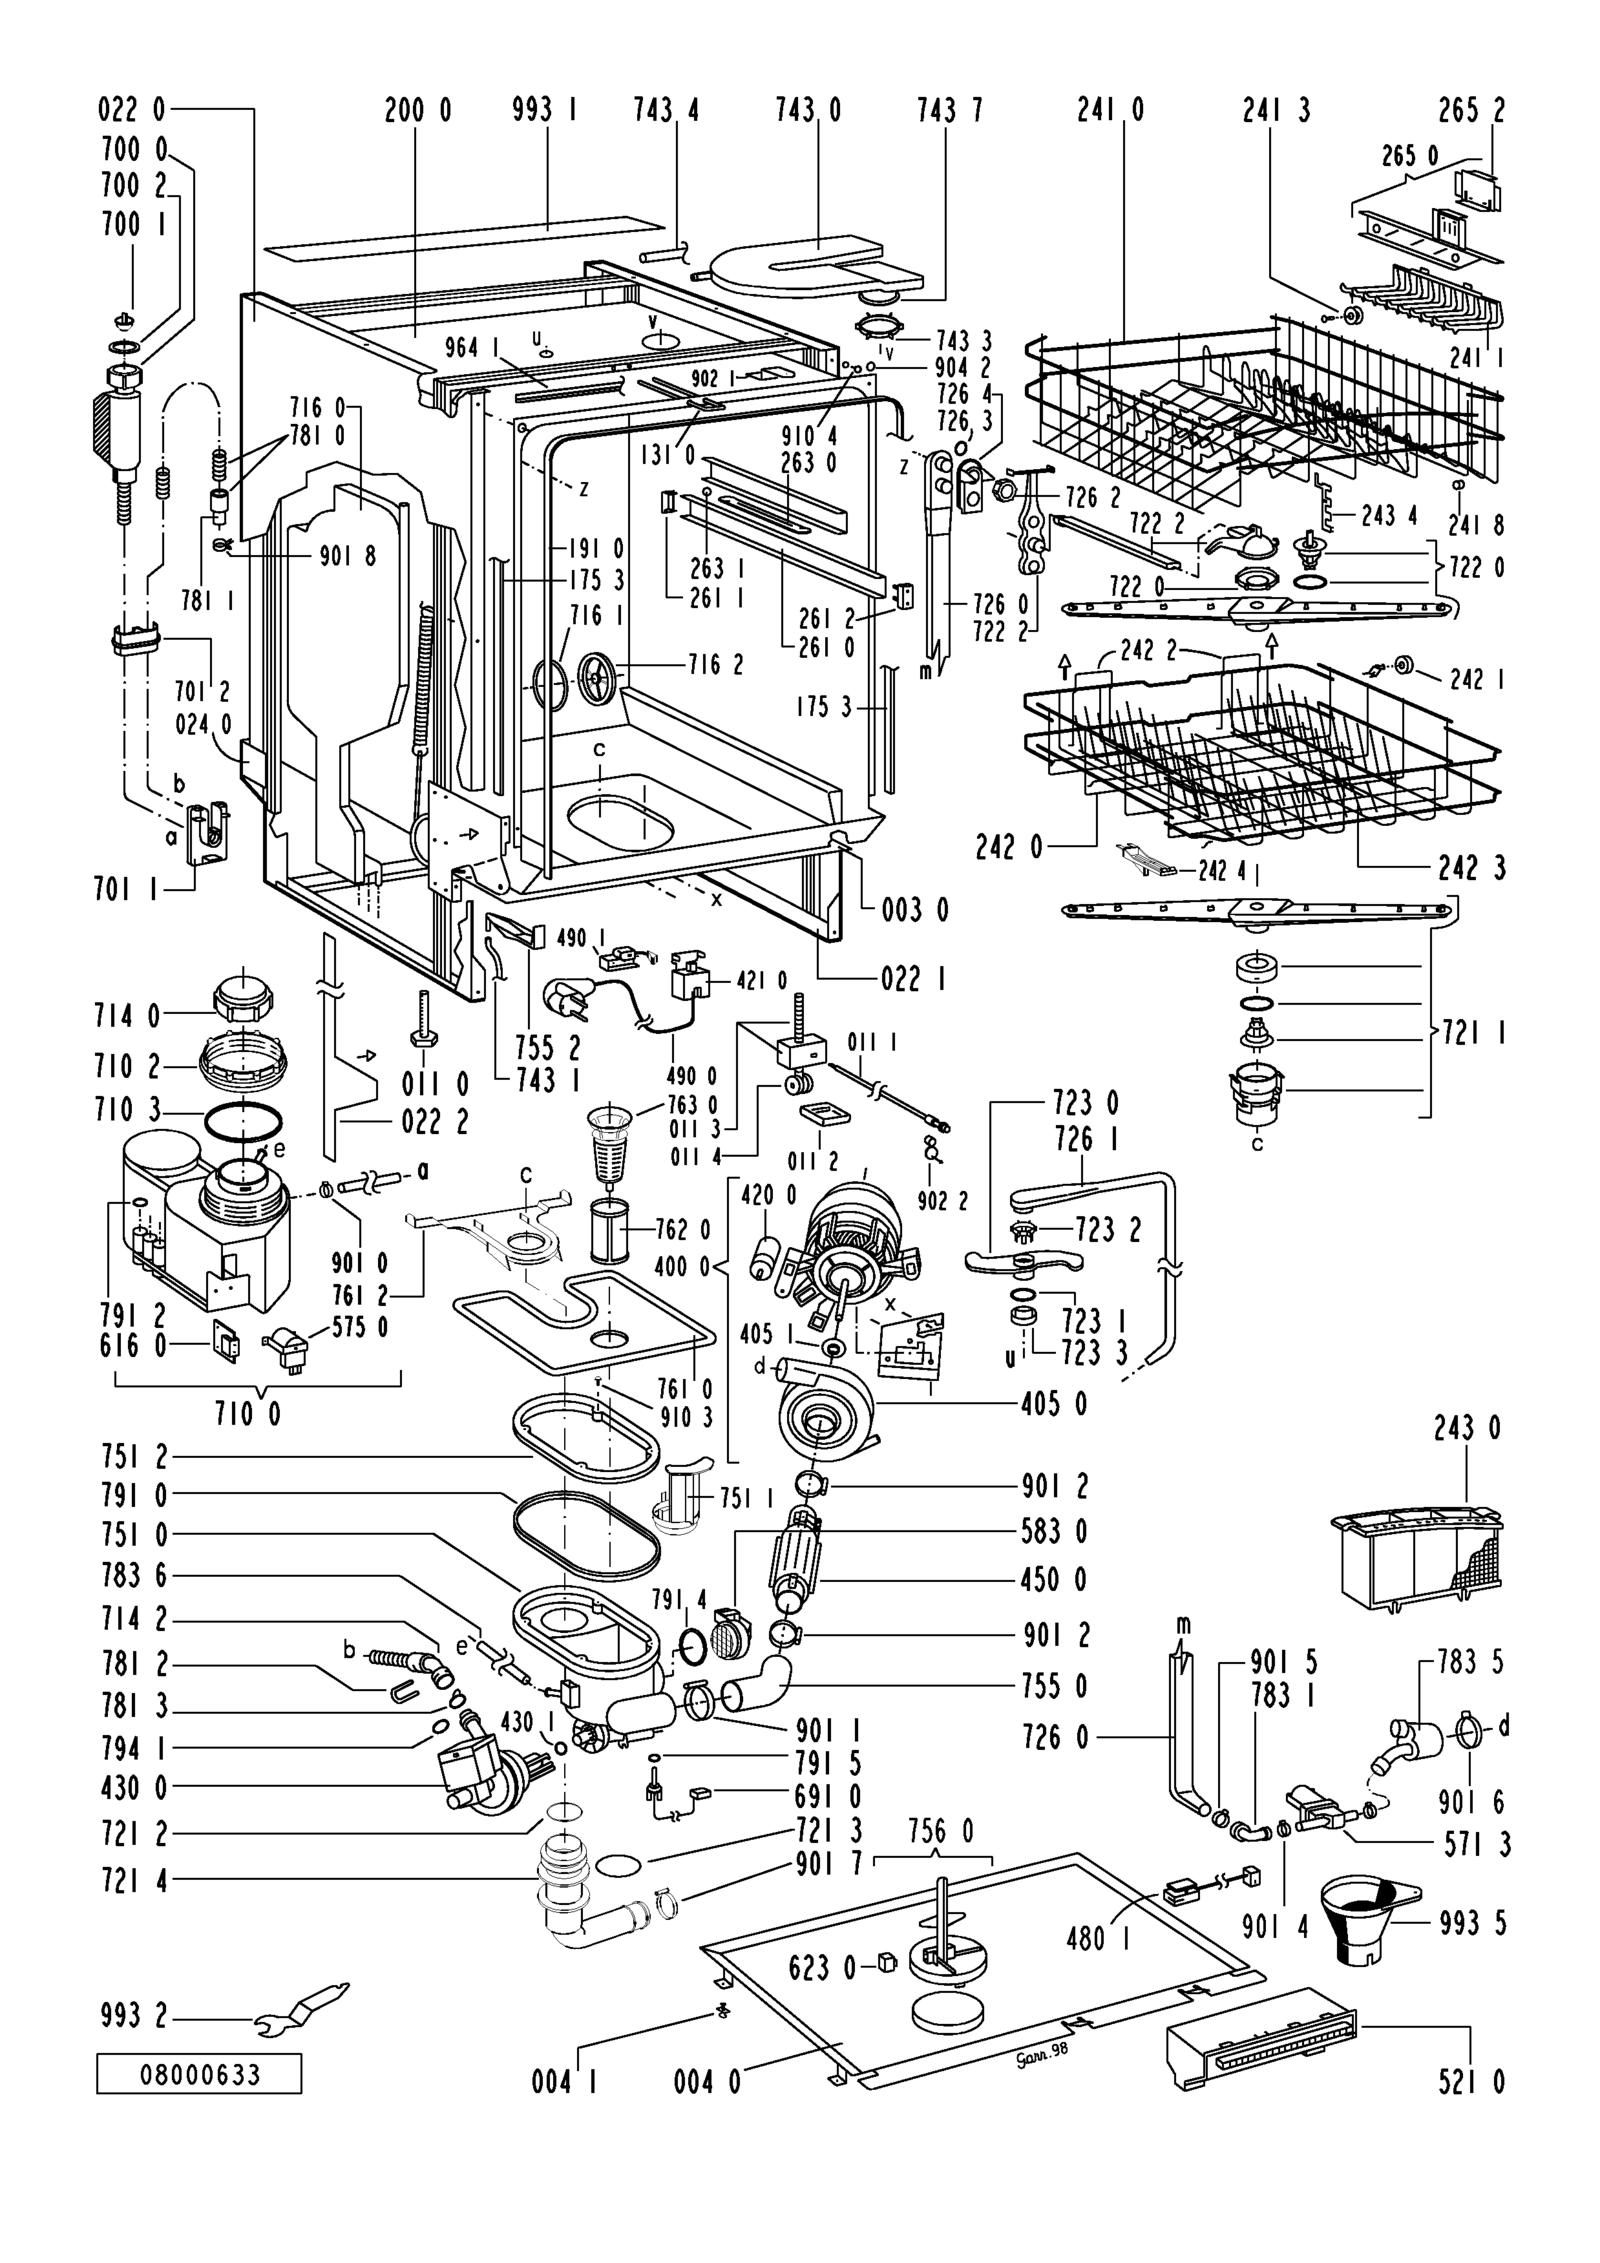 Service Manual - Whirlpool ADG 957/1 M - Dish washerOpweb.de